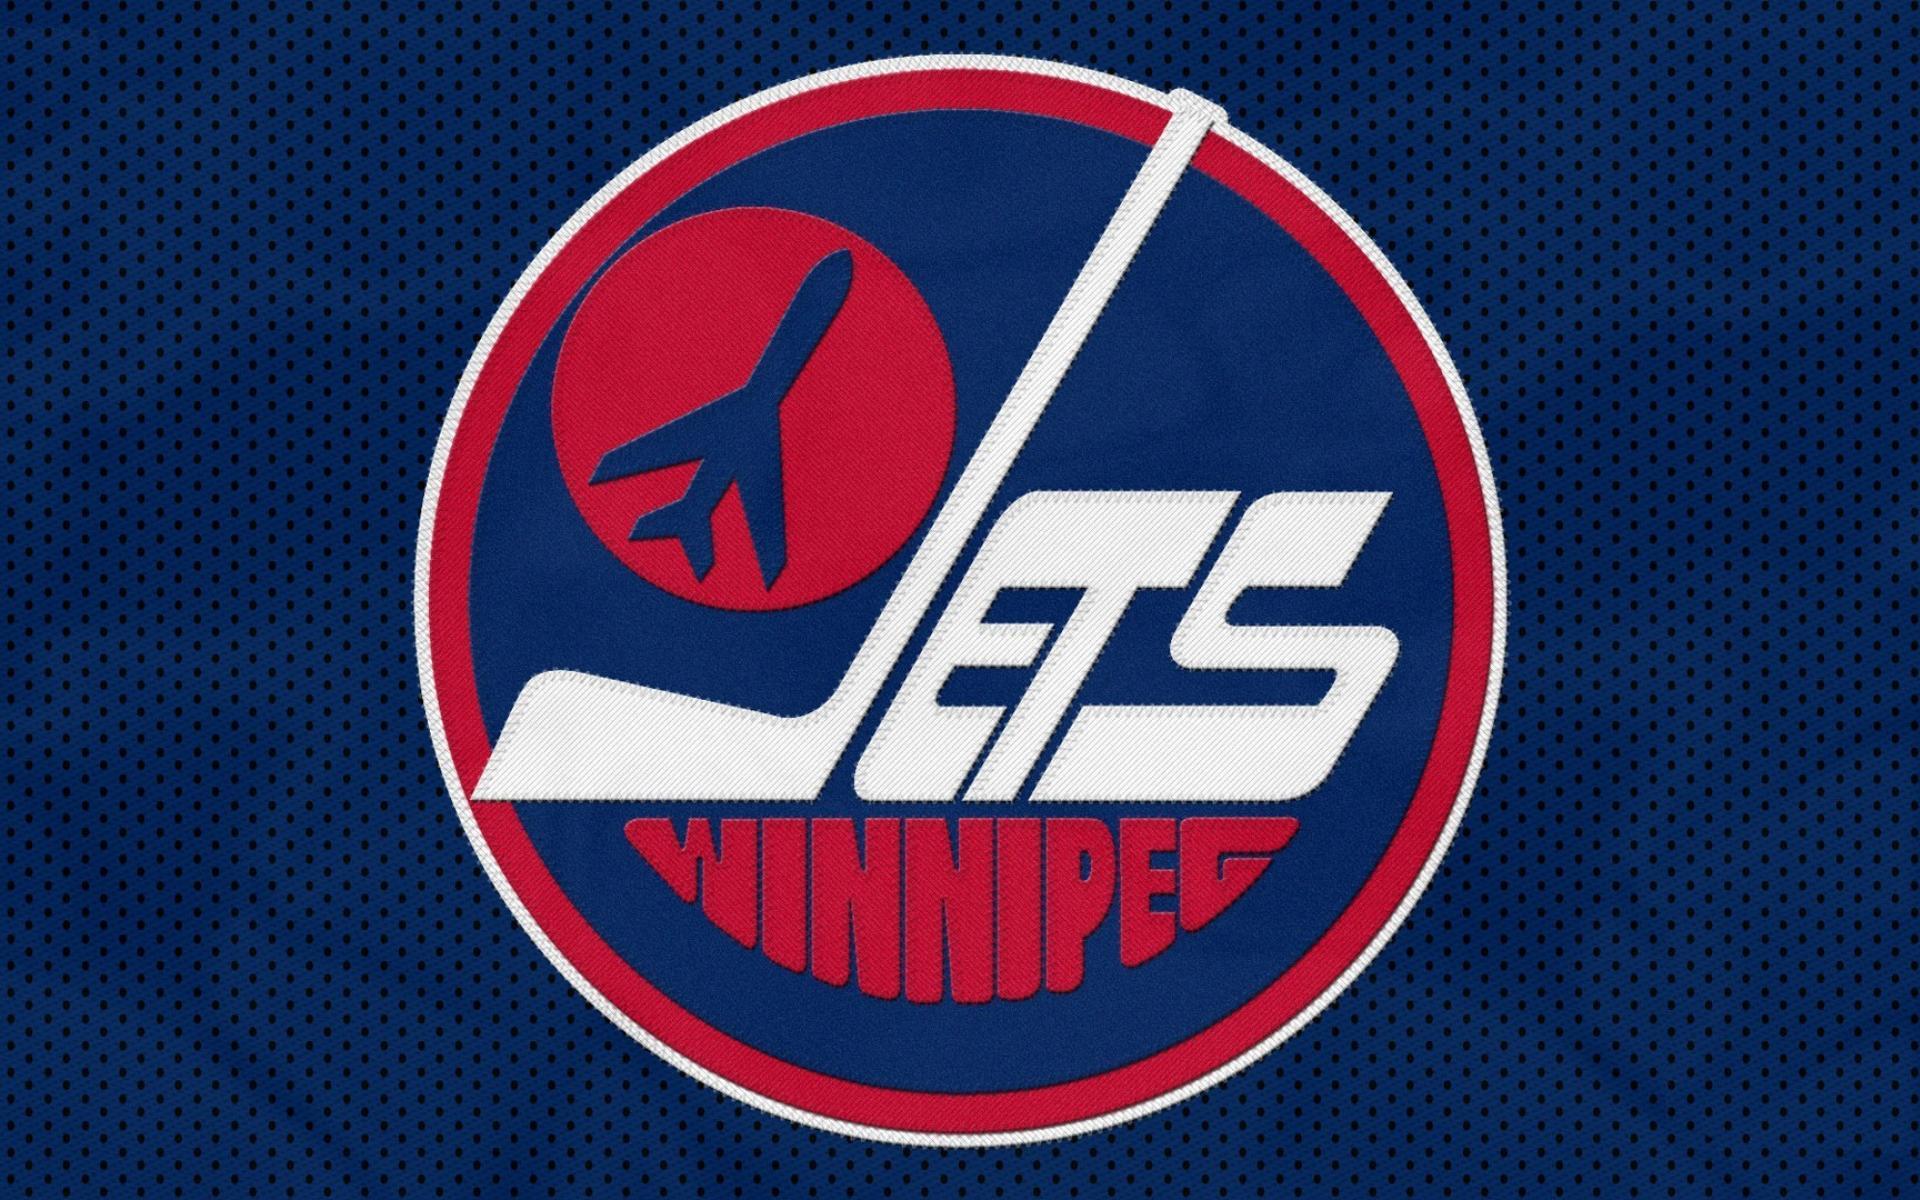 Nhl jersey ice logos winnipeg jets 80s wallpaper 56398 1920x1200